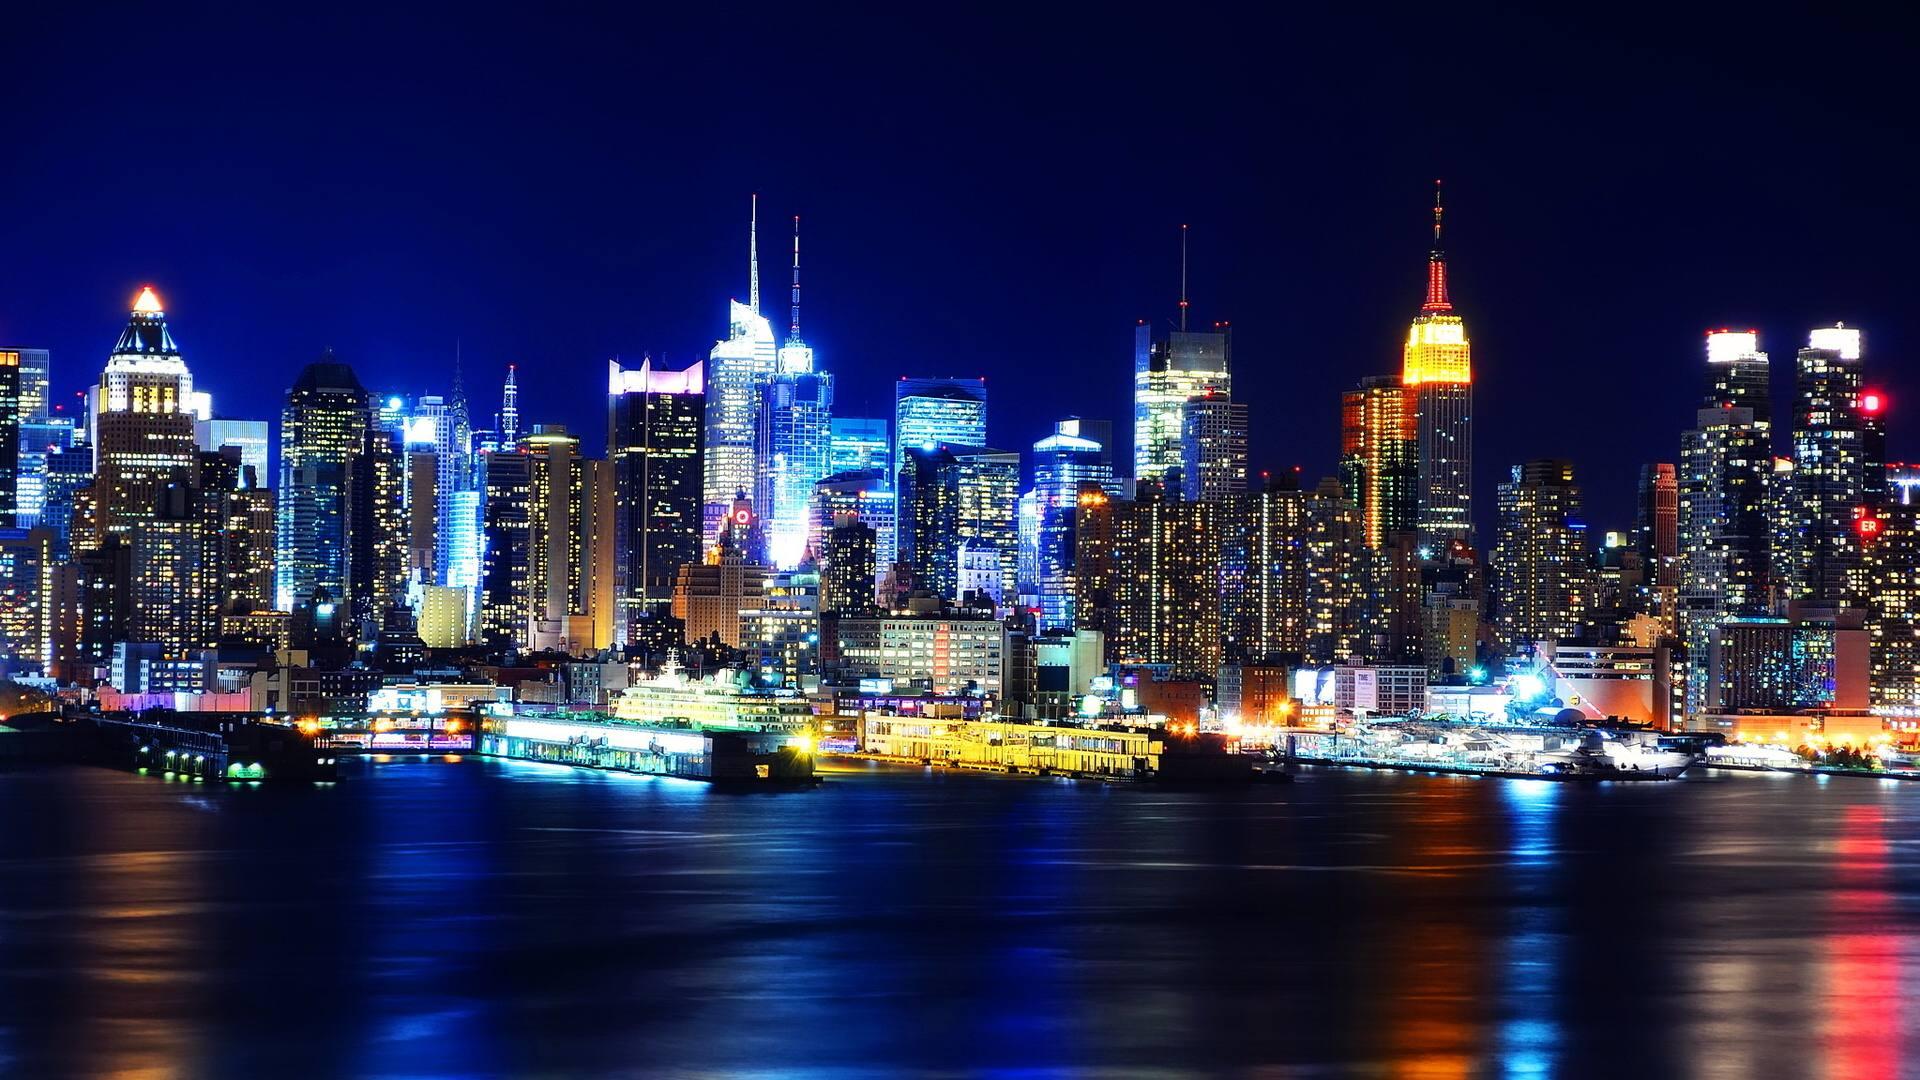 012 -  New York - Manhattan - USA